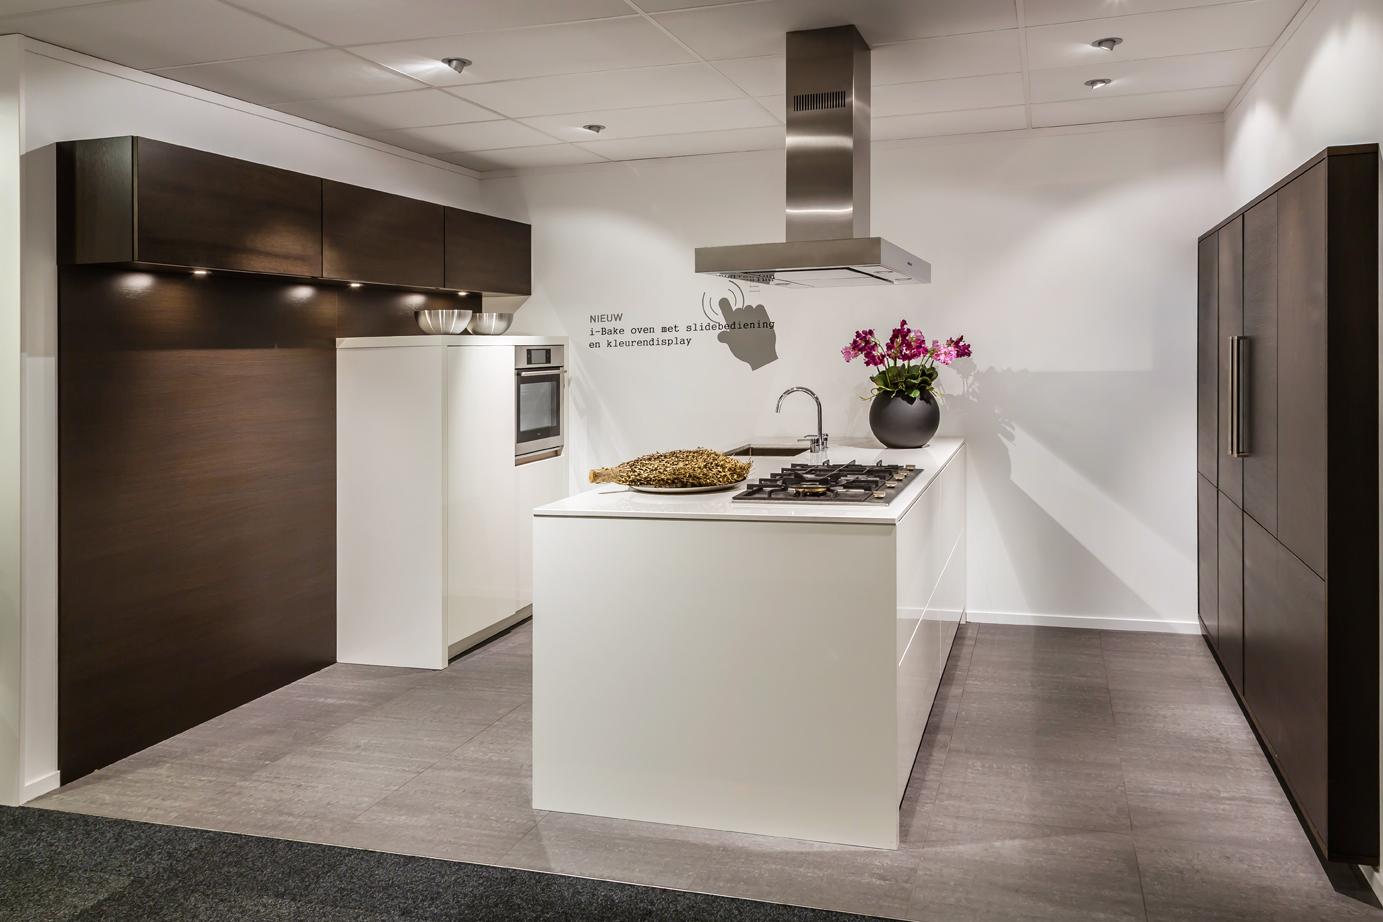 Design Keukens Opruiming : Showroomkeukens Sla je slag met onze opruiming DB Keukens